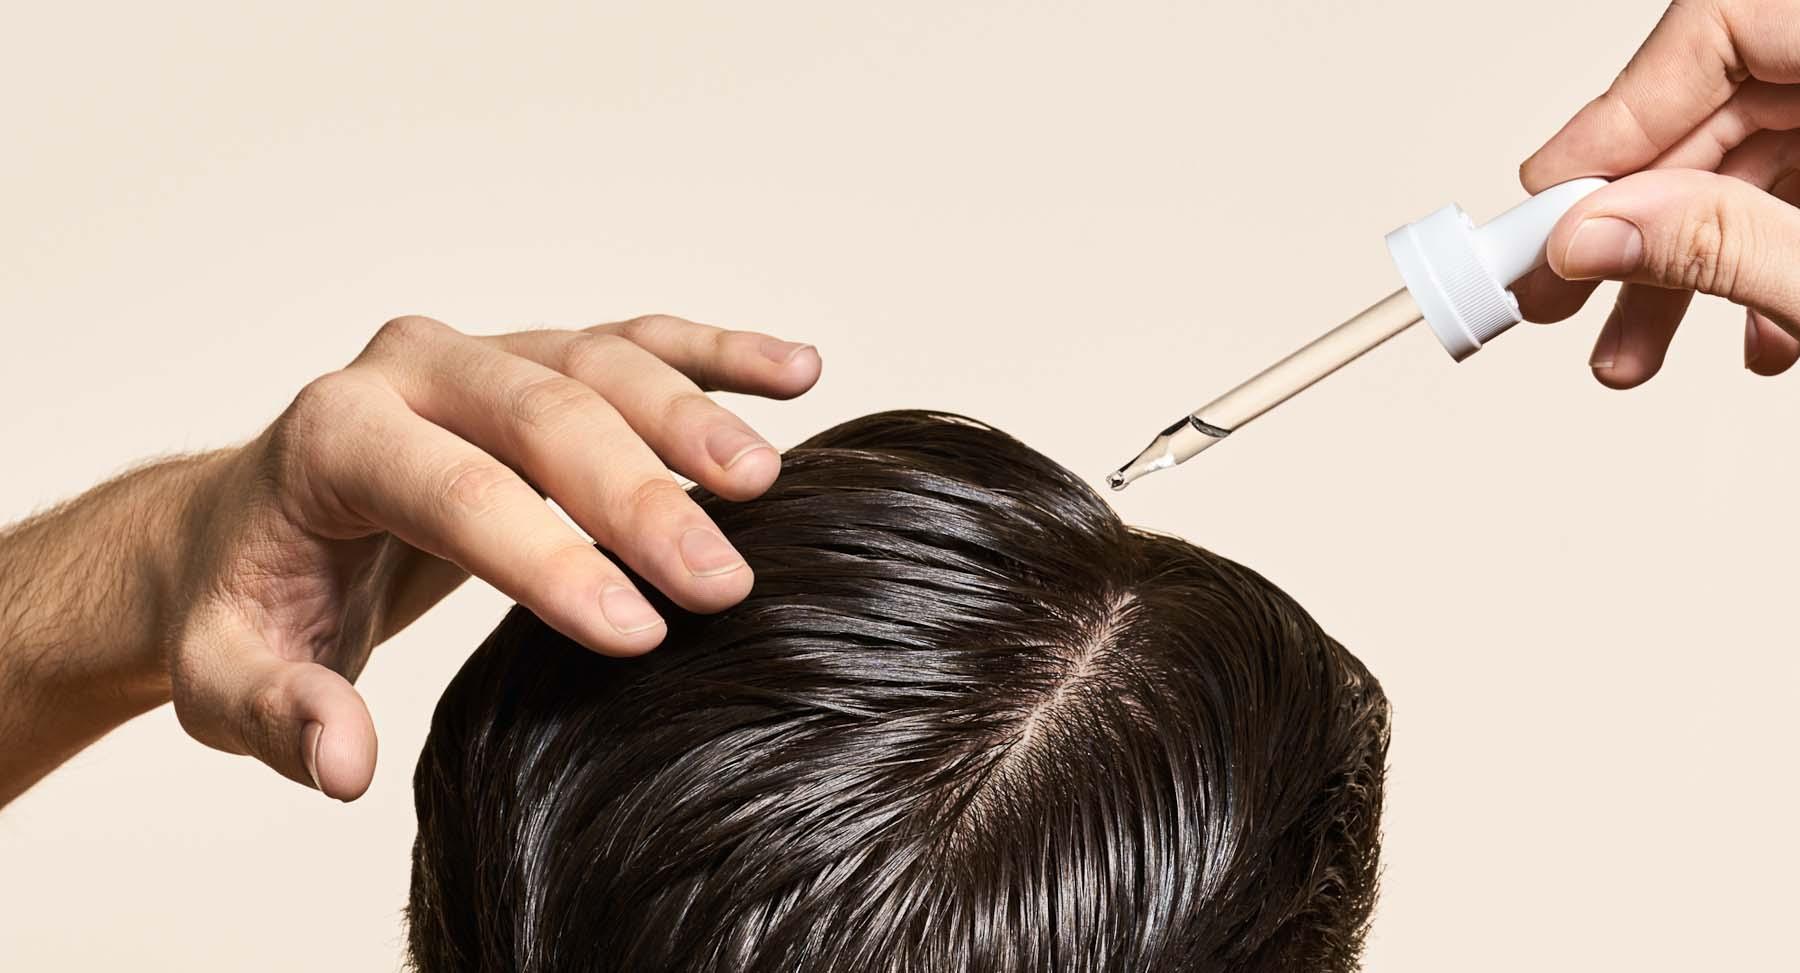 Non-surgical hair restoration treatment in Hyderabad, fue hair transplant near Habsiguda